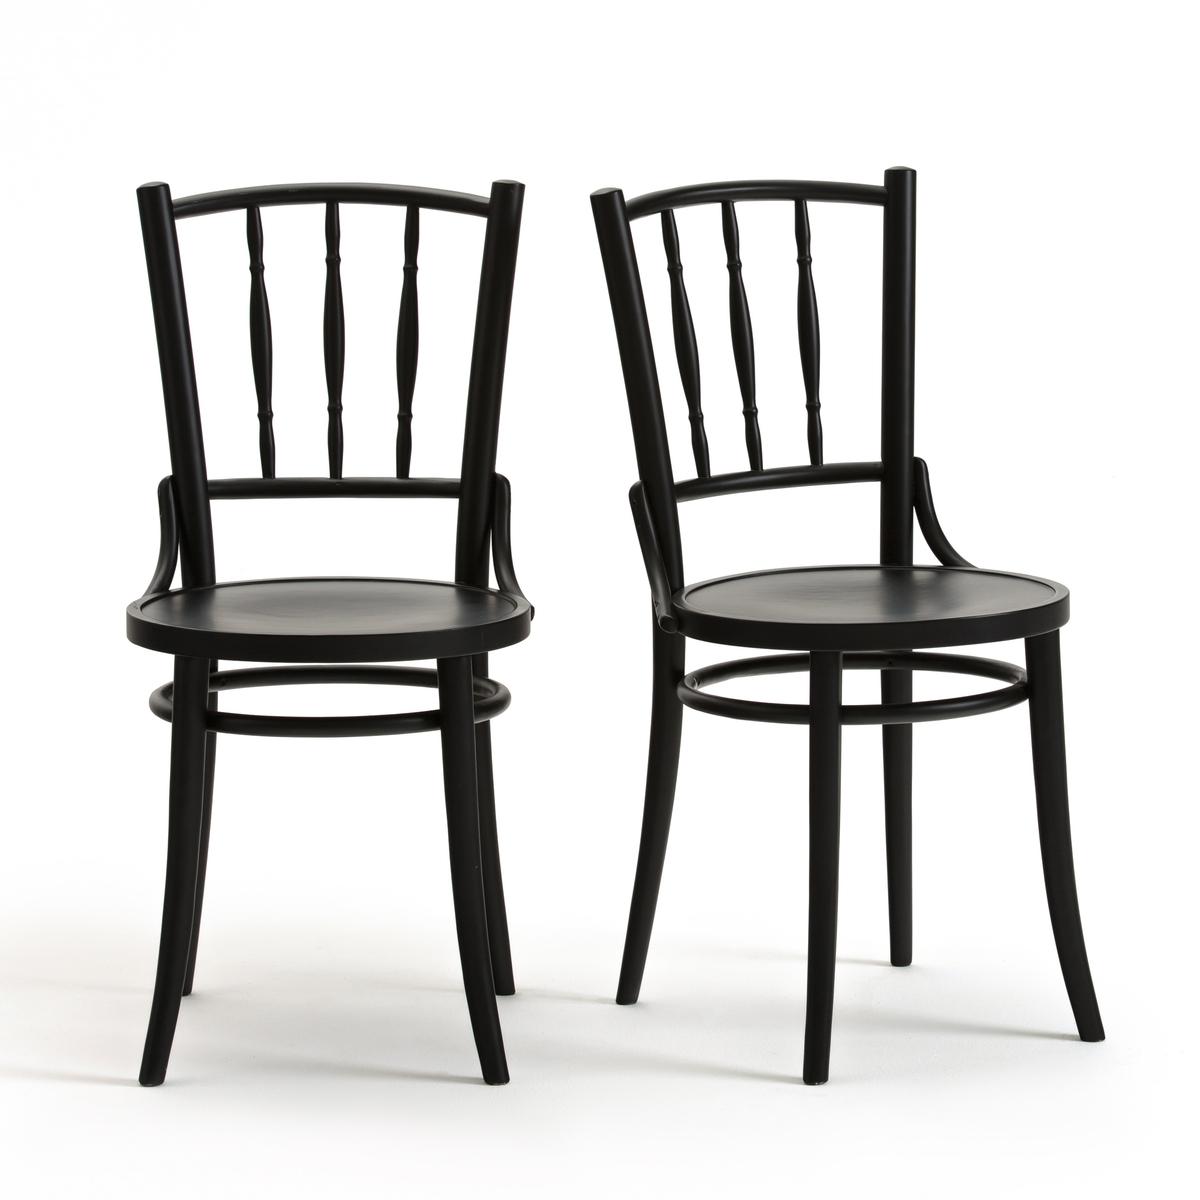 2 стула в стиле бистро TROCKET